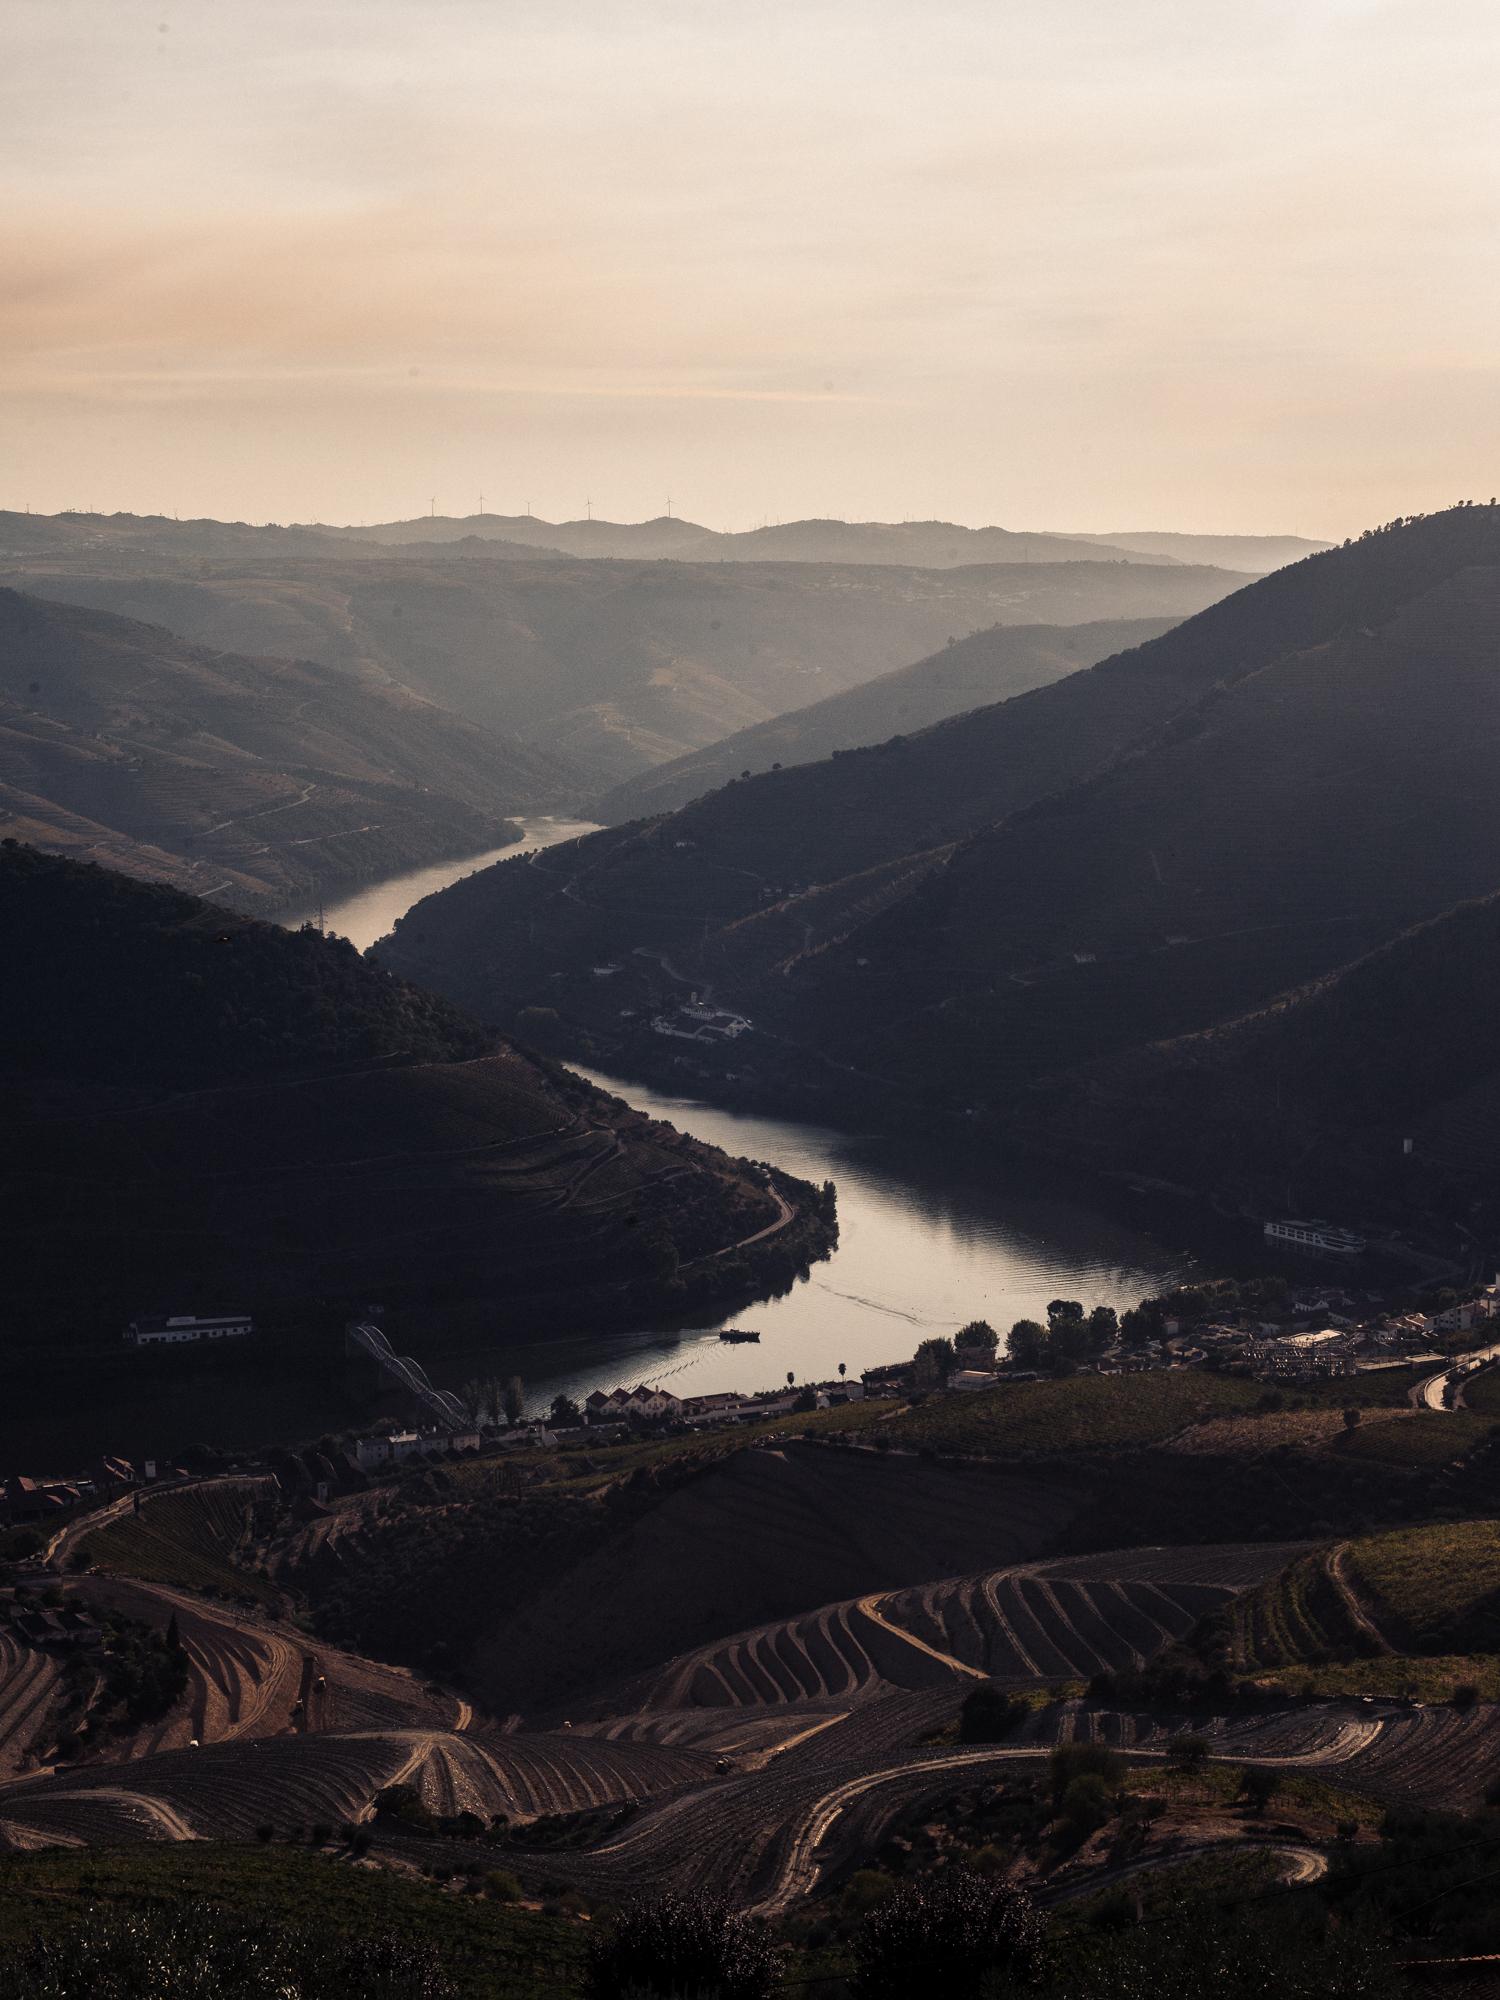 Portugal's Douro valley wine region for EasyJet Traveller.